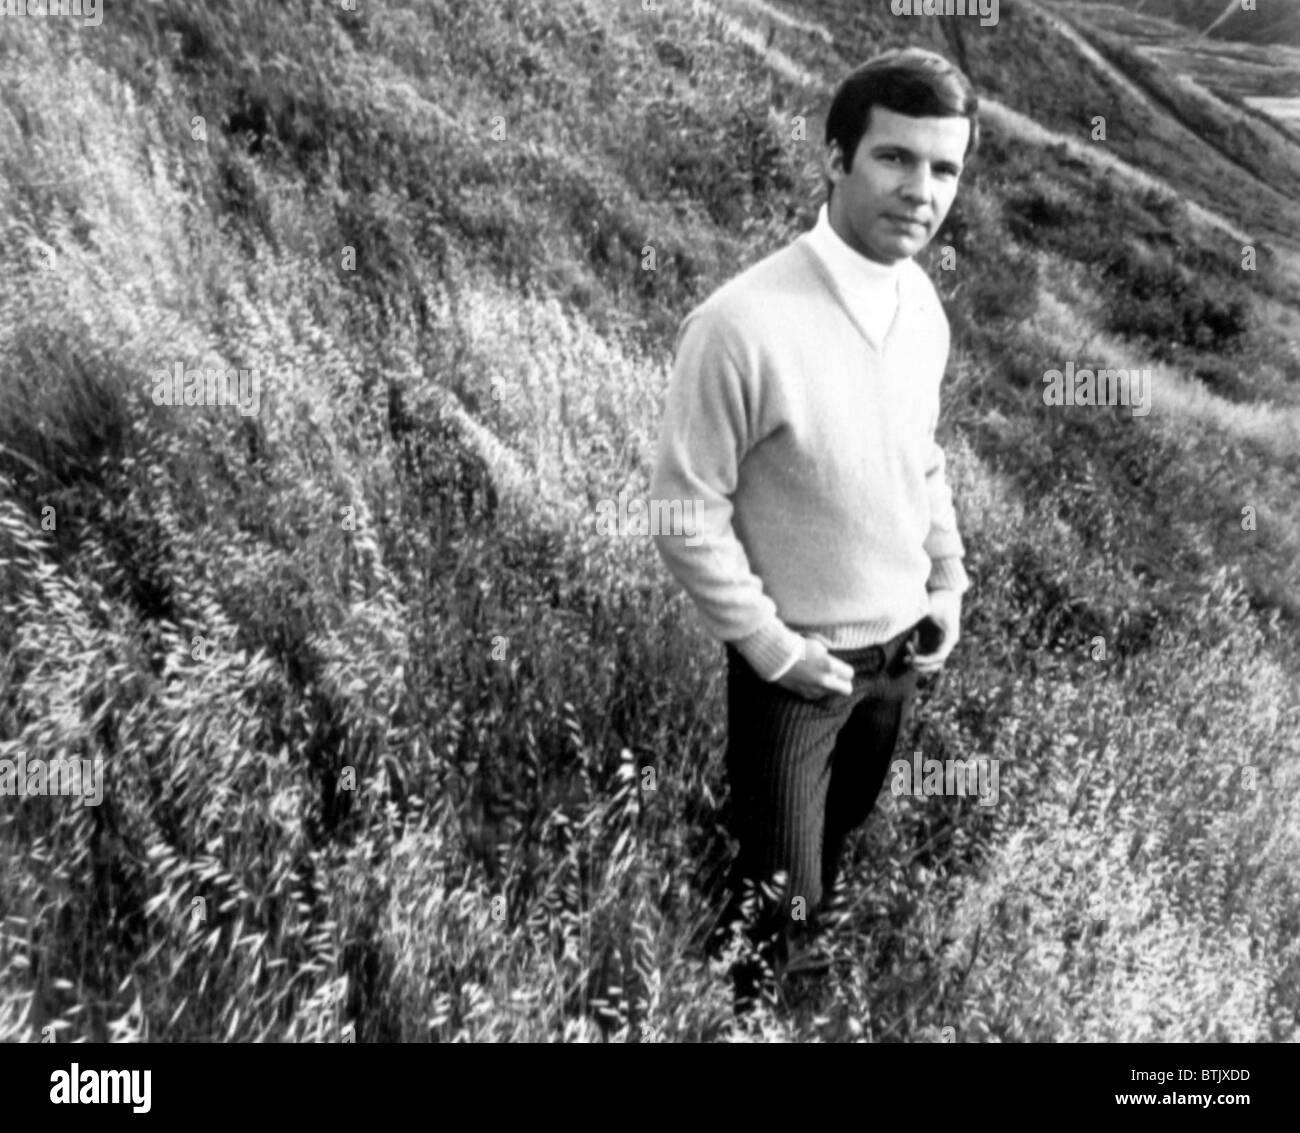 Bobby Vee, ca. 1968 - Stock Image